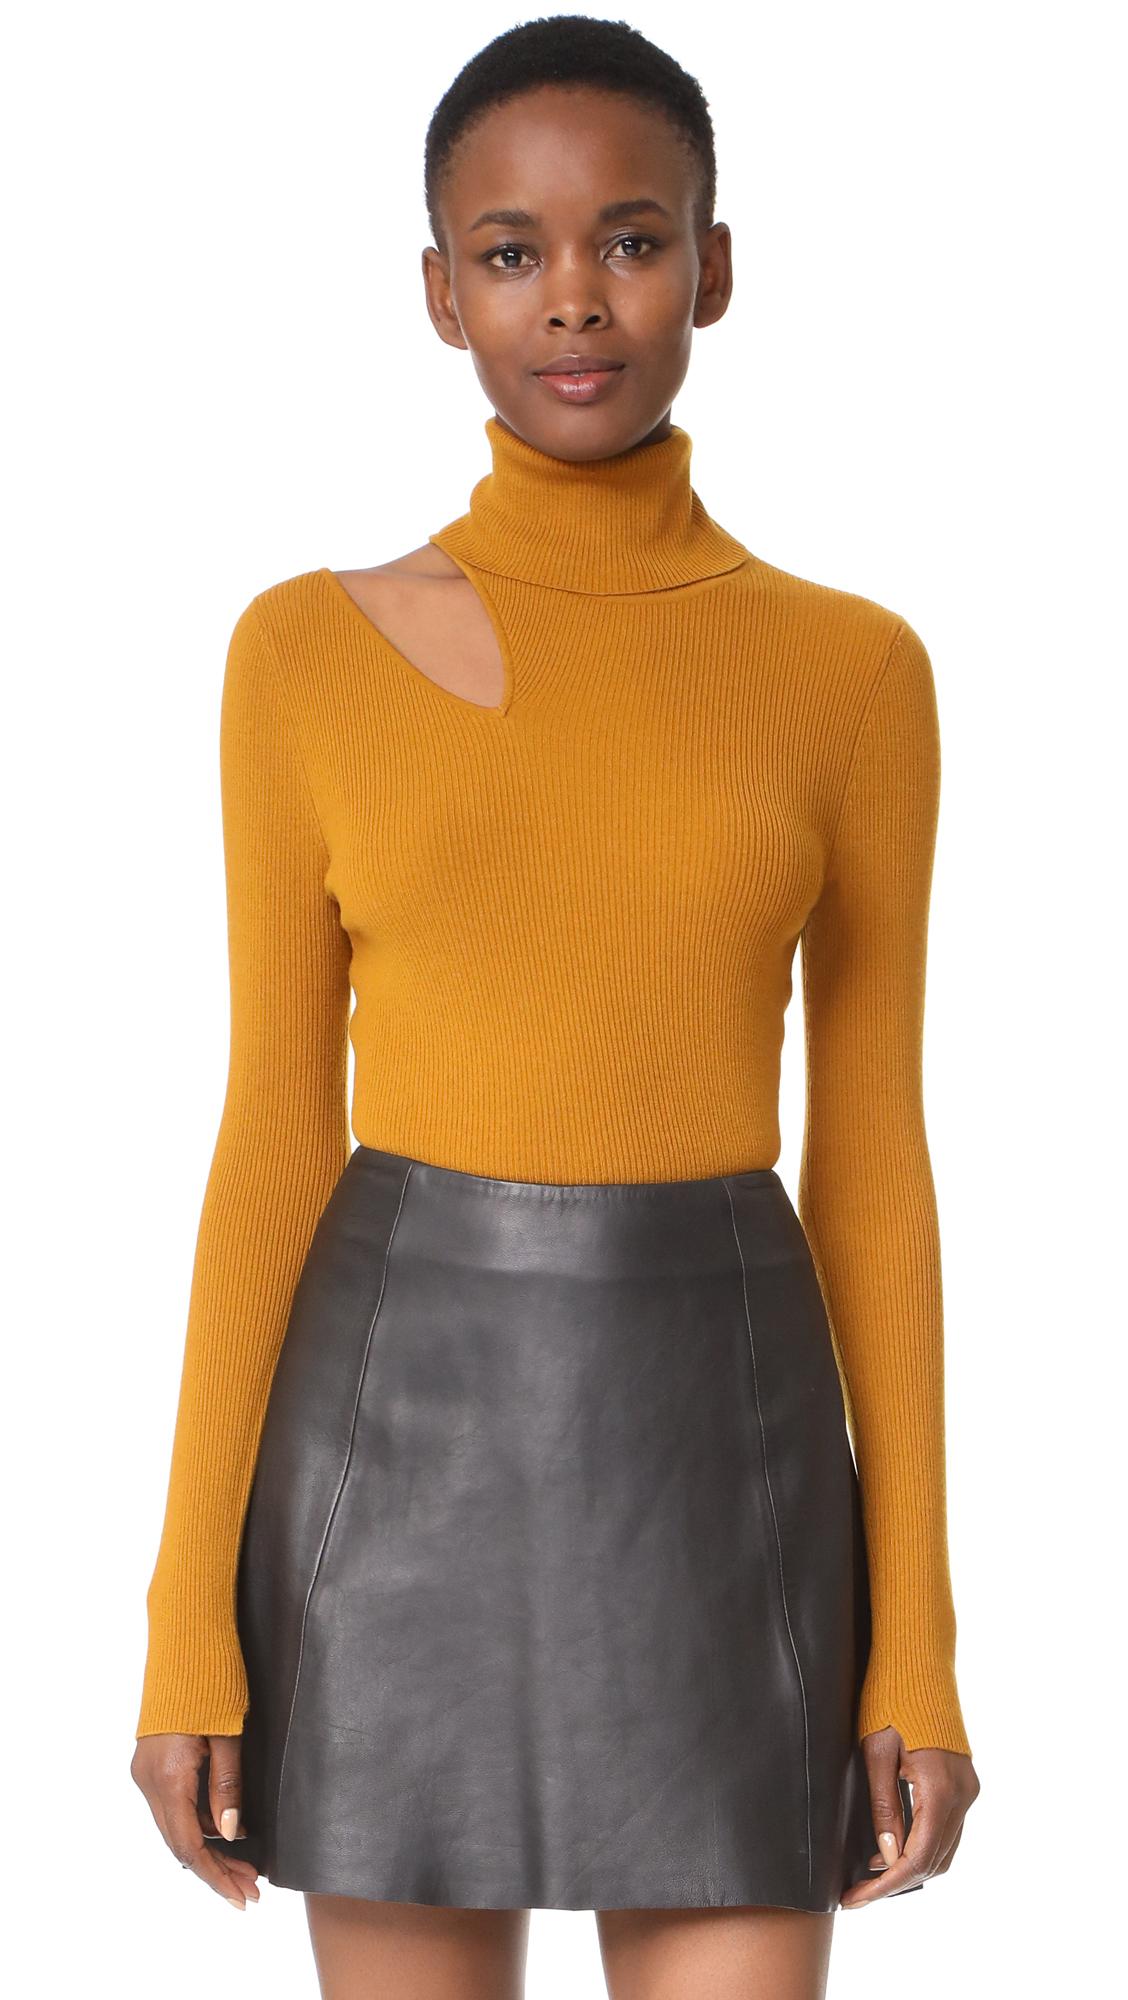 A.L.C. Kara Sweater - Amber